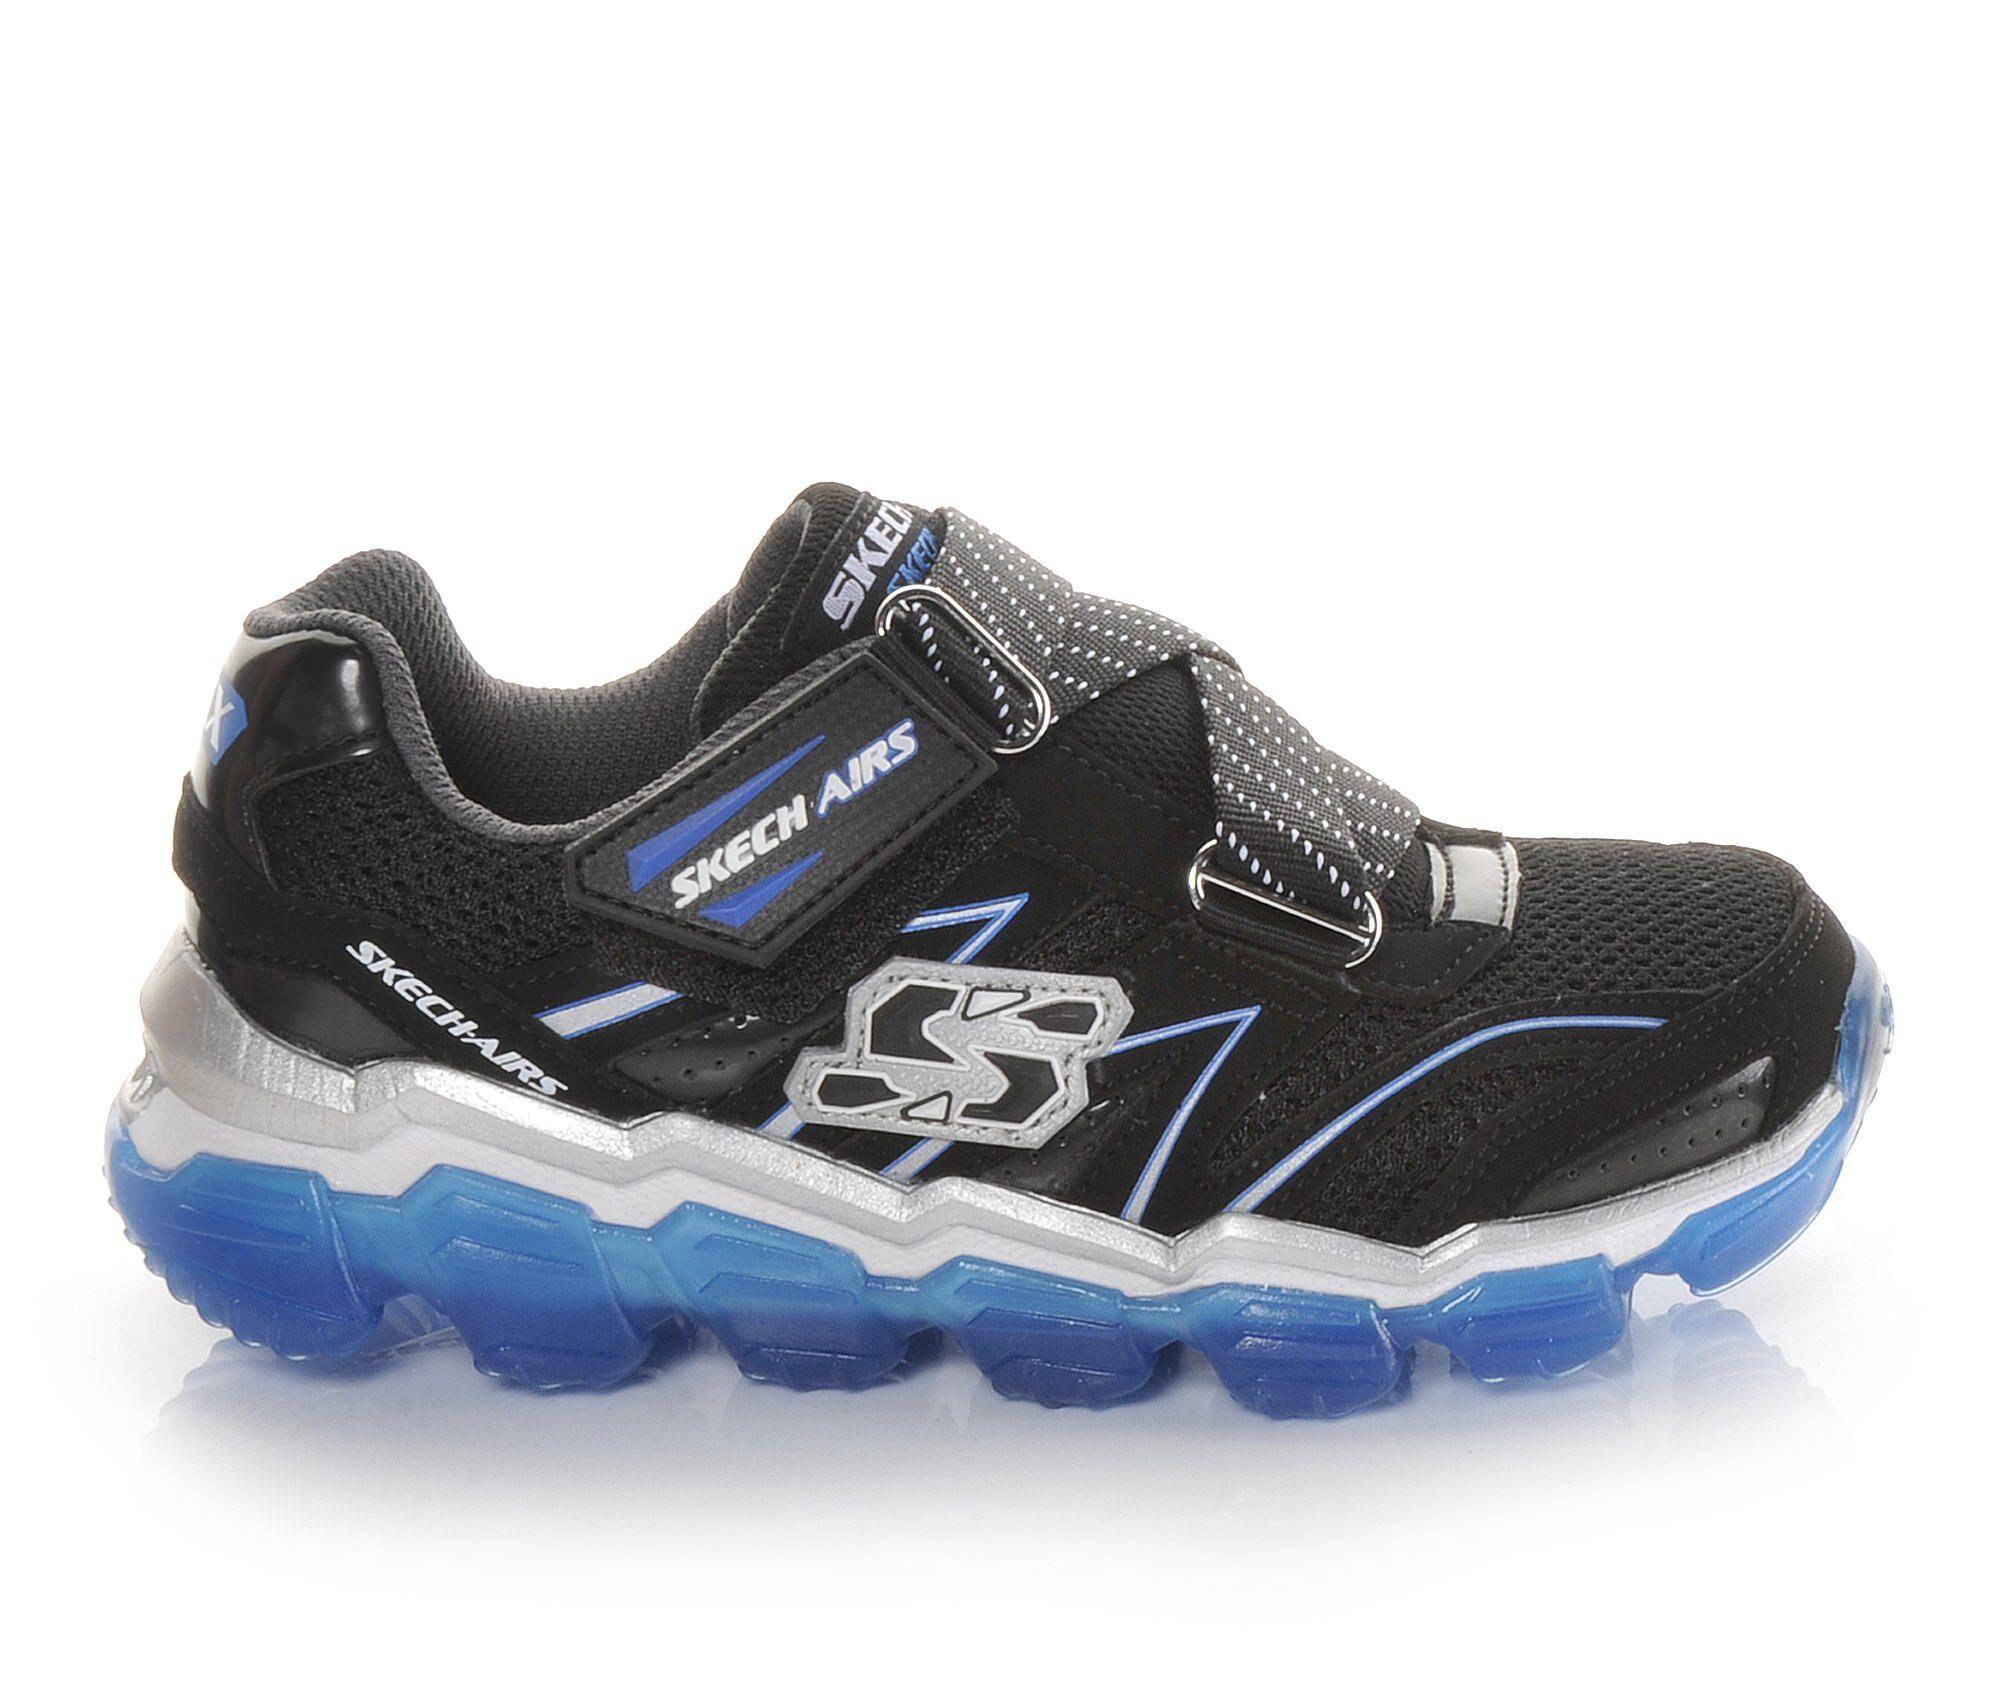 online Skechers Zapatos Hombre Skechers Skech Air 10 5 5 Hombre Zapatos Sports Zapatos 5ce074